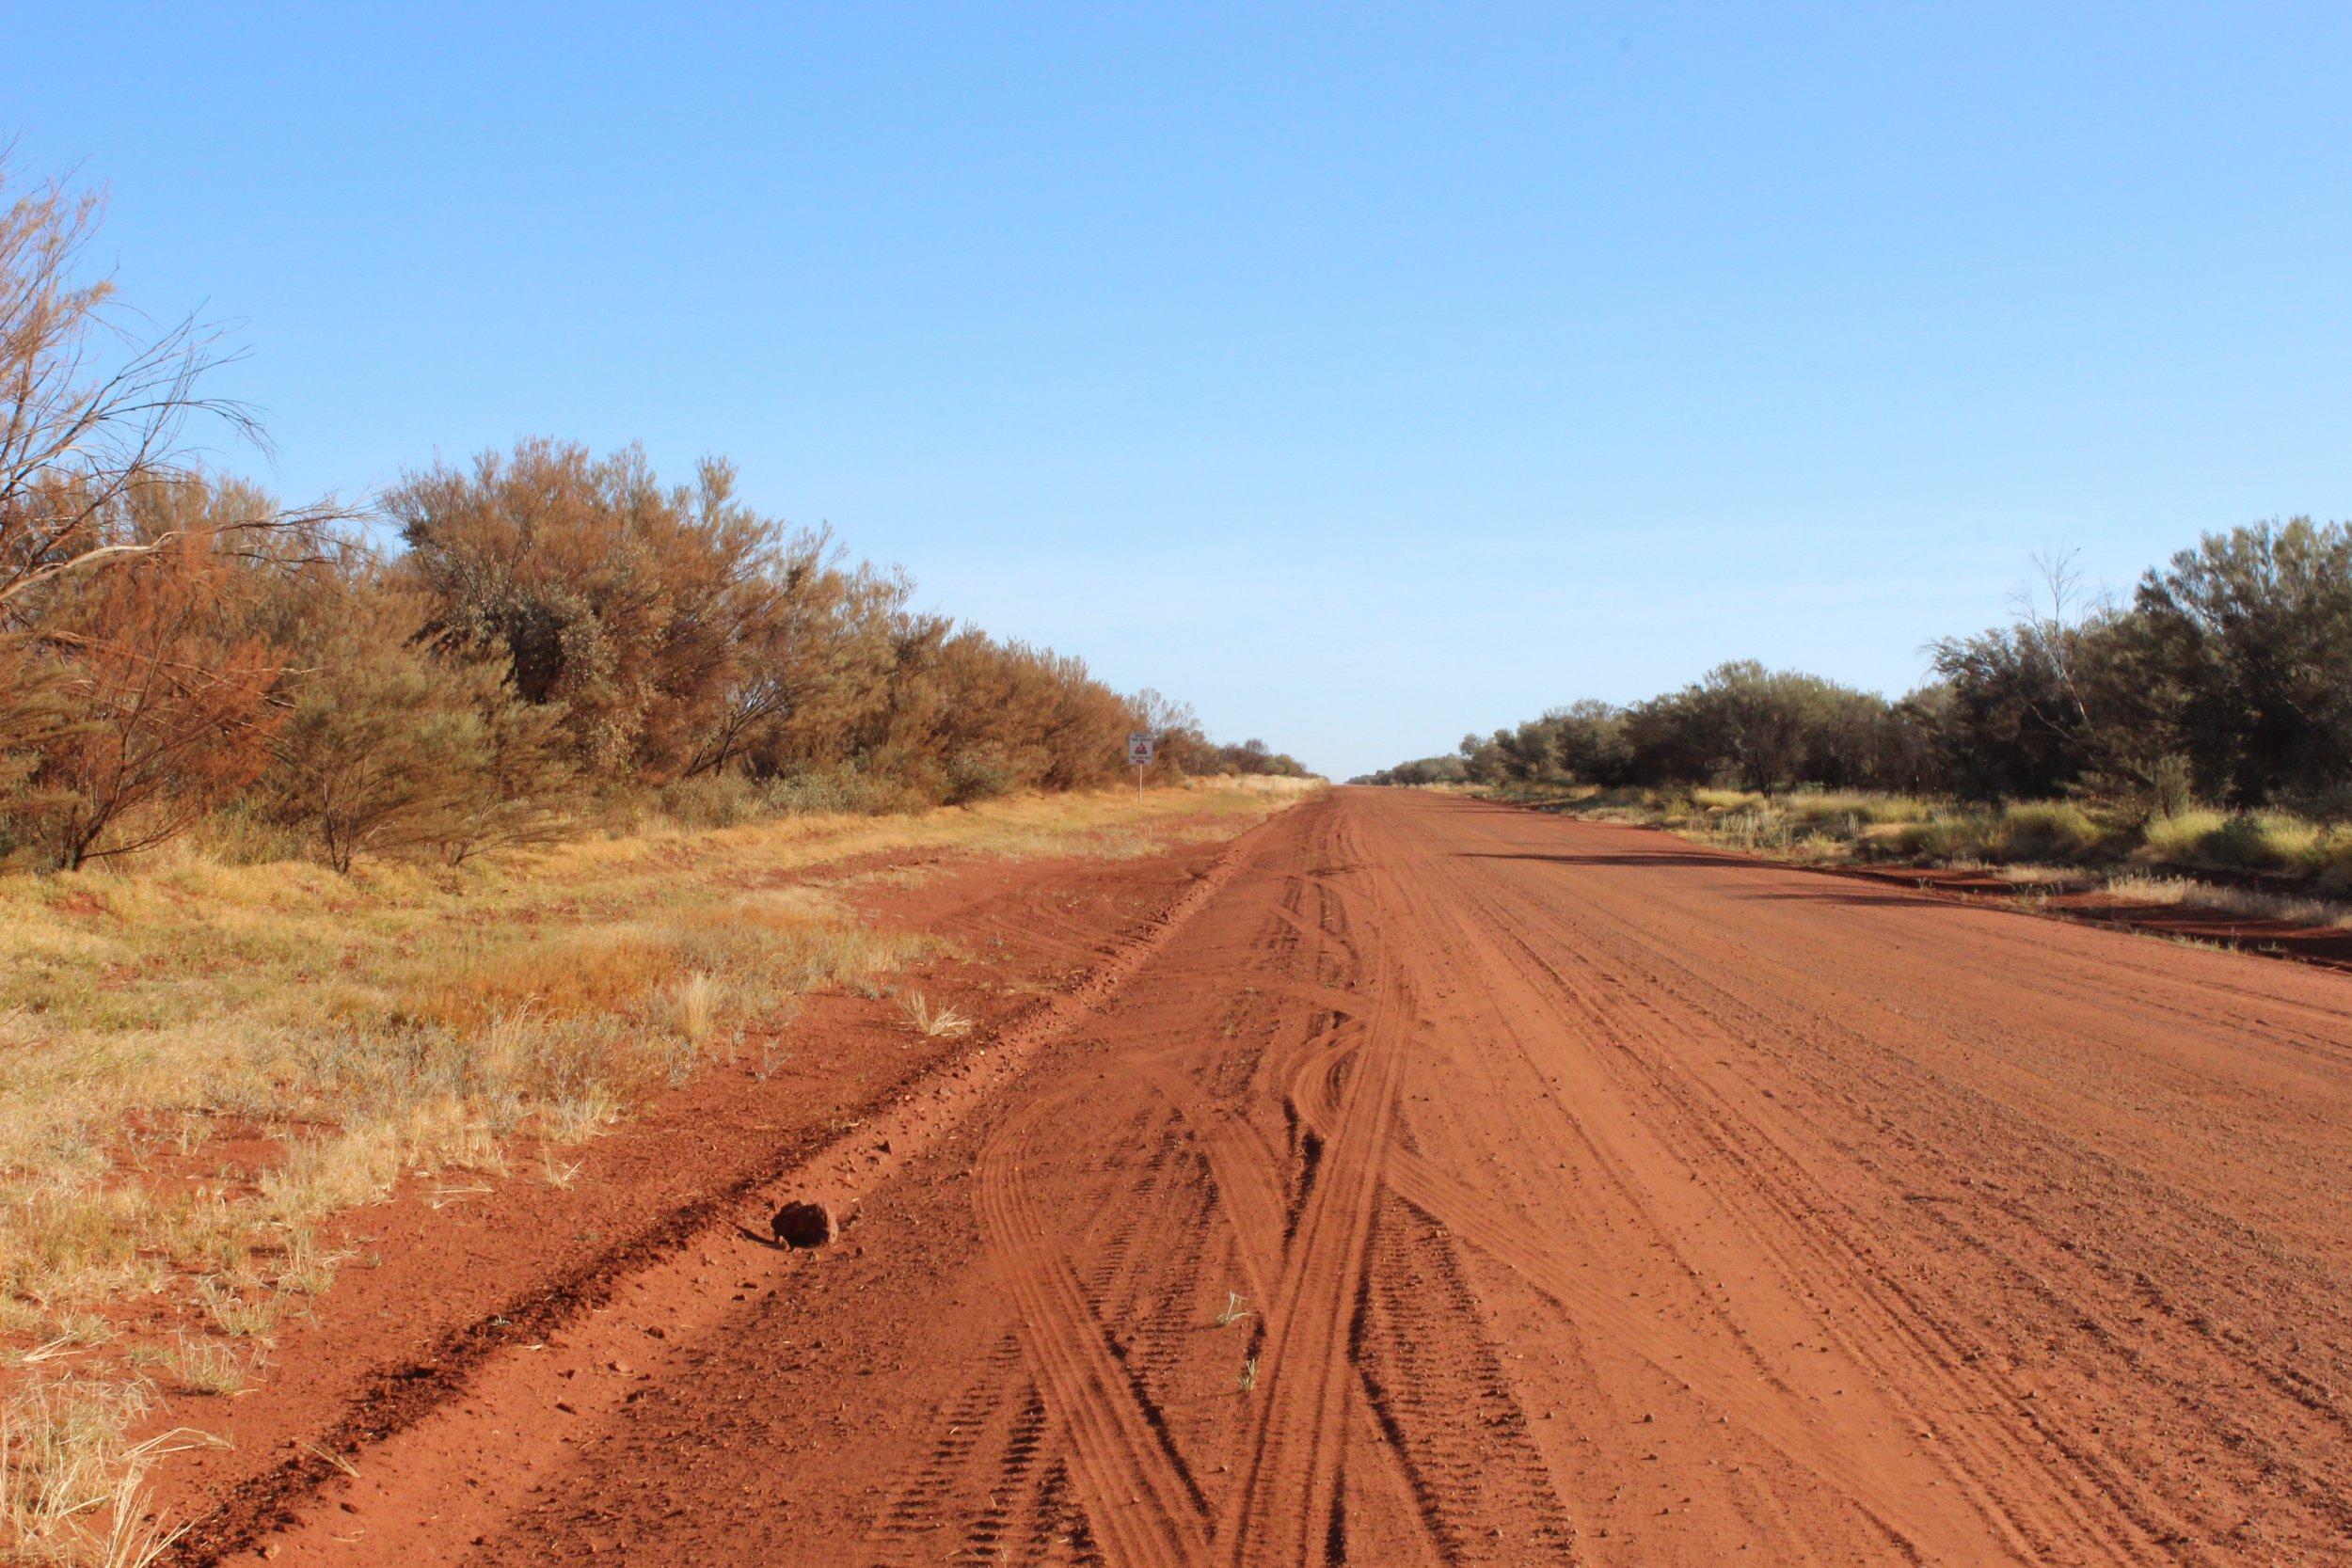 Bay Gallery Home : Australian Aboriginal Art, Wallpapers, Tiles, Rugs, Tables & Accessories. Design with Origin.